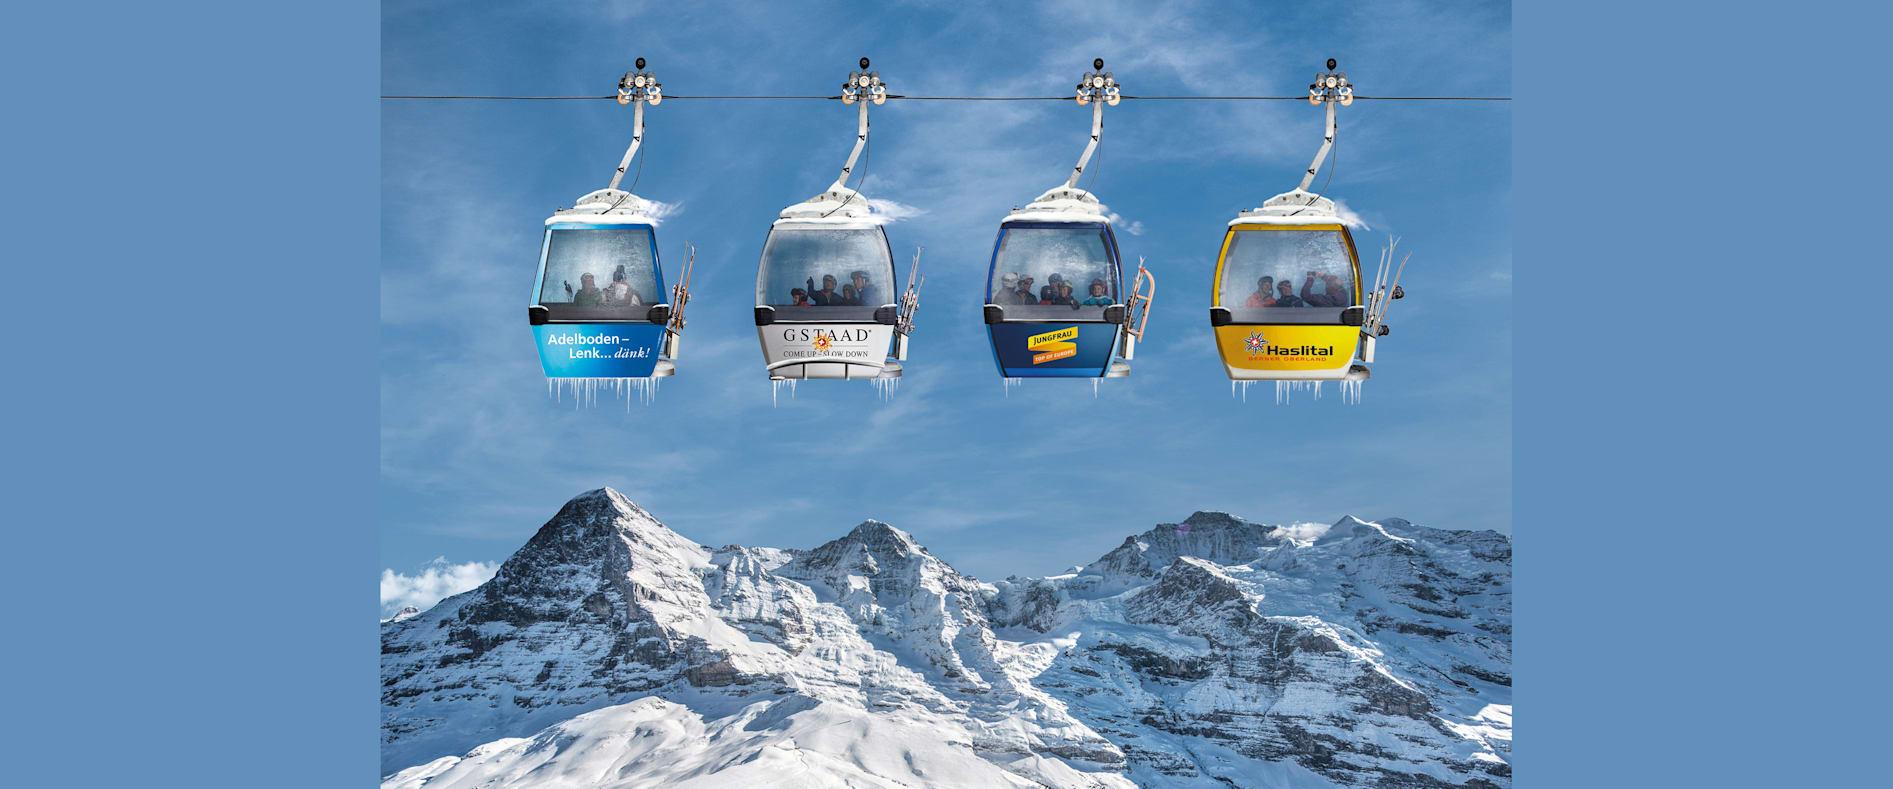 Top4 Ski Region